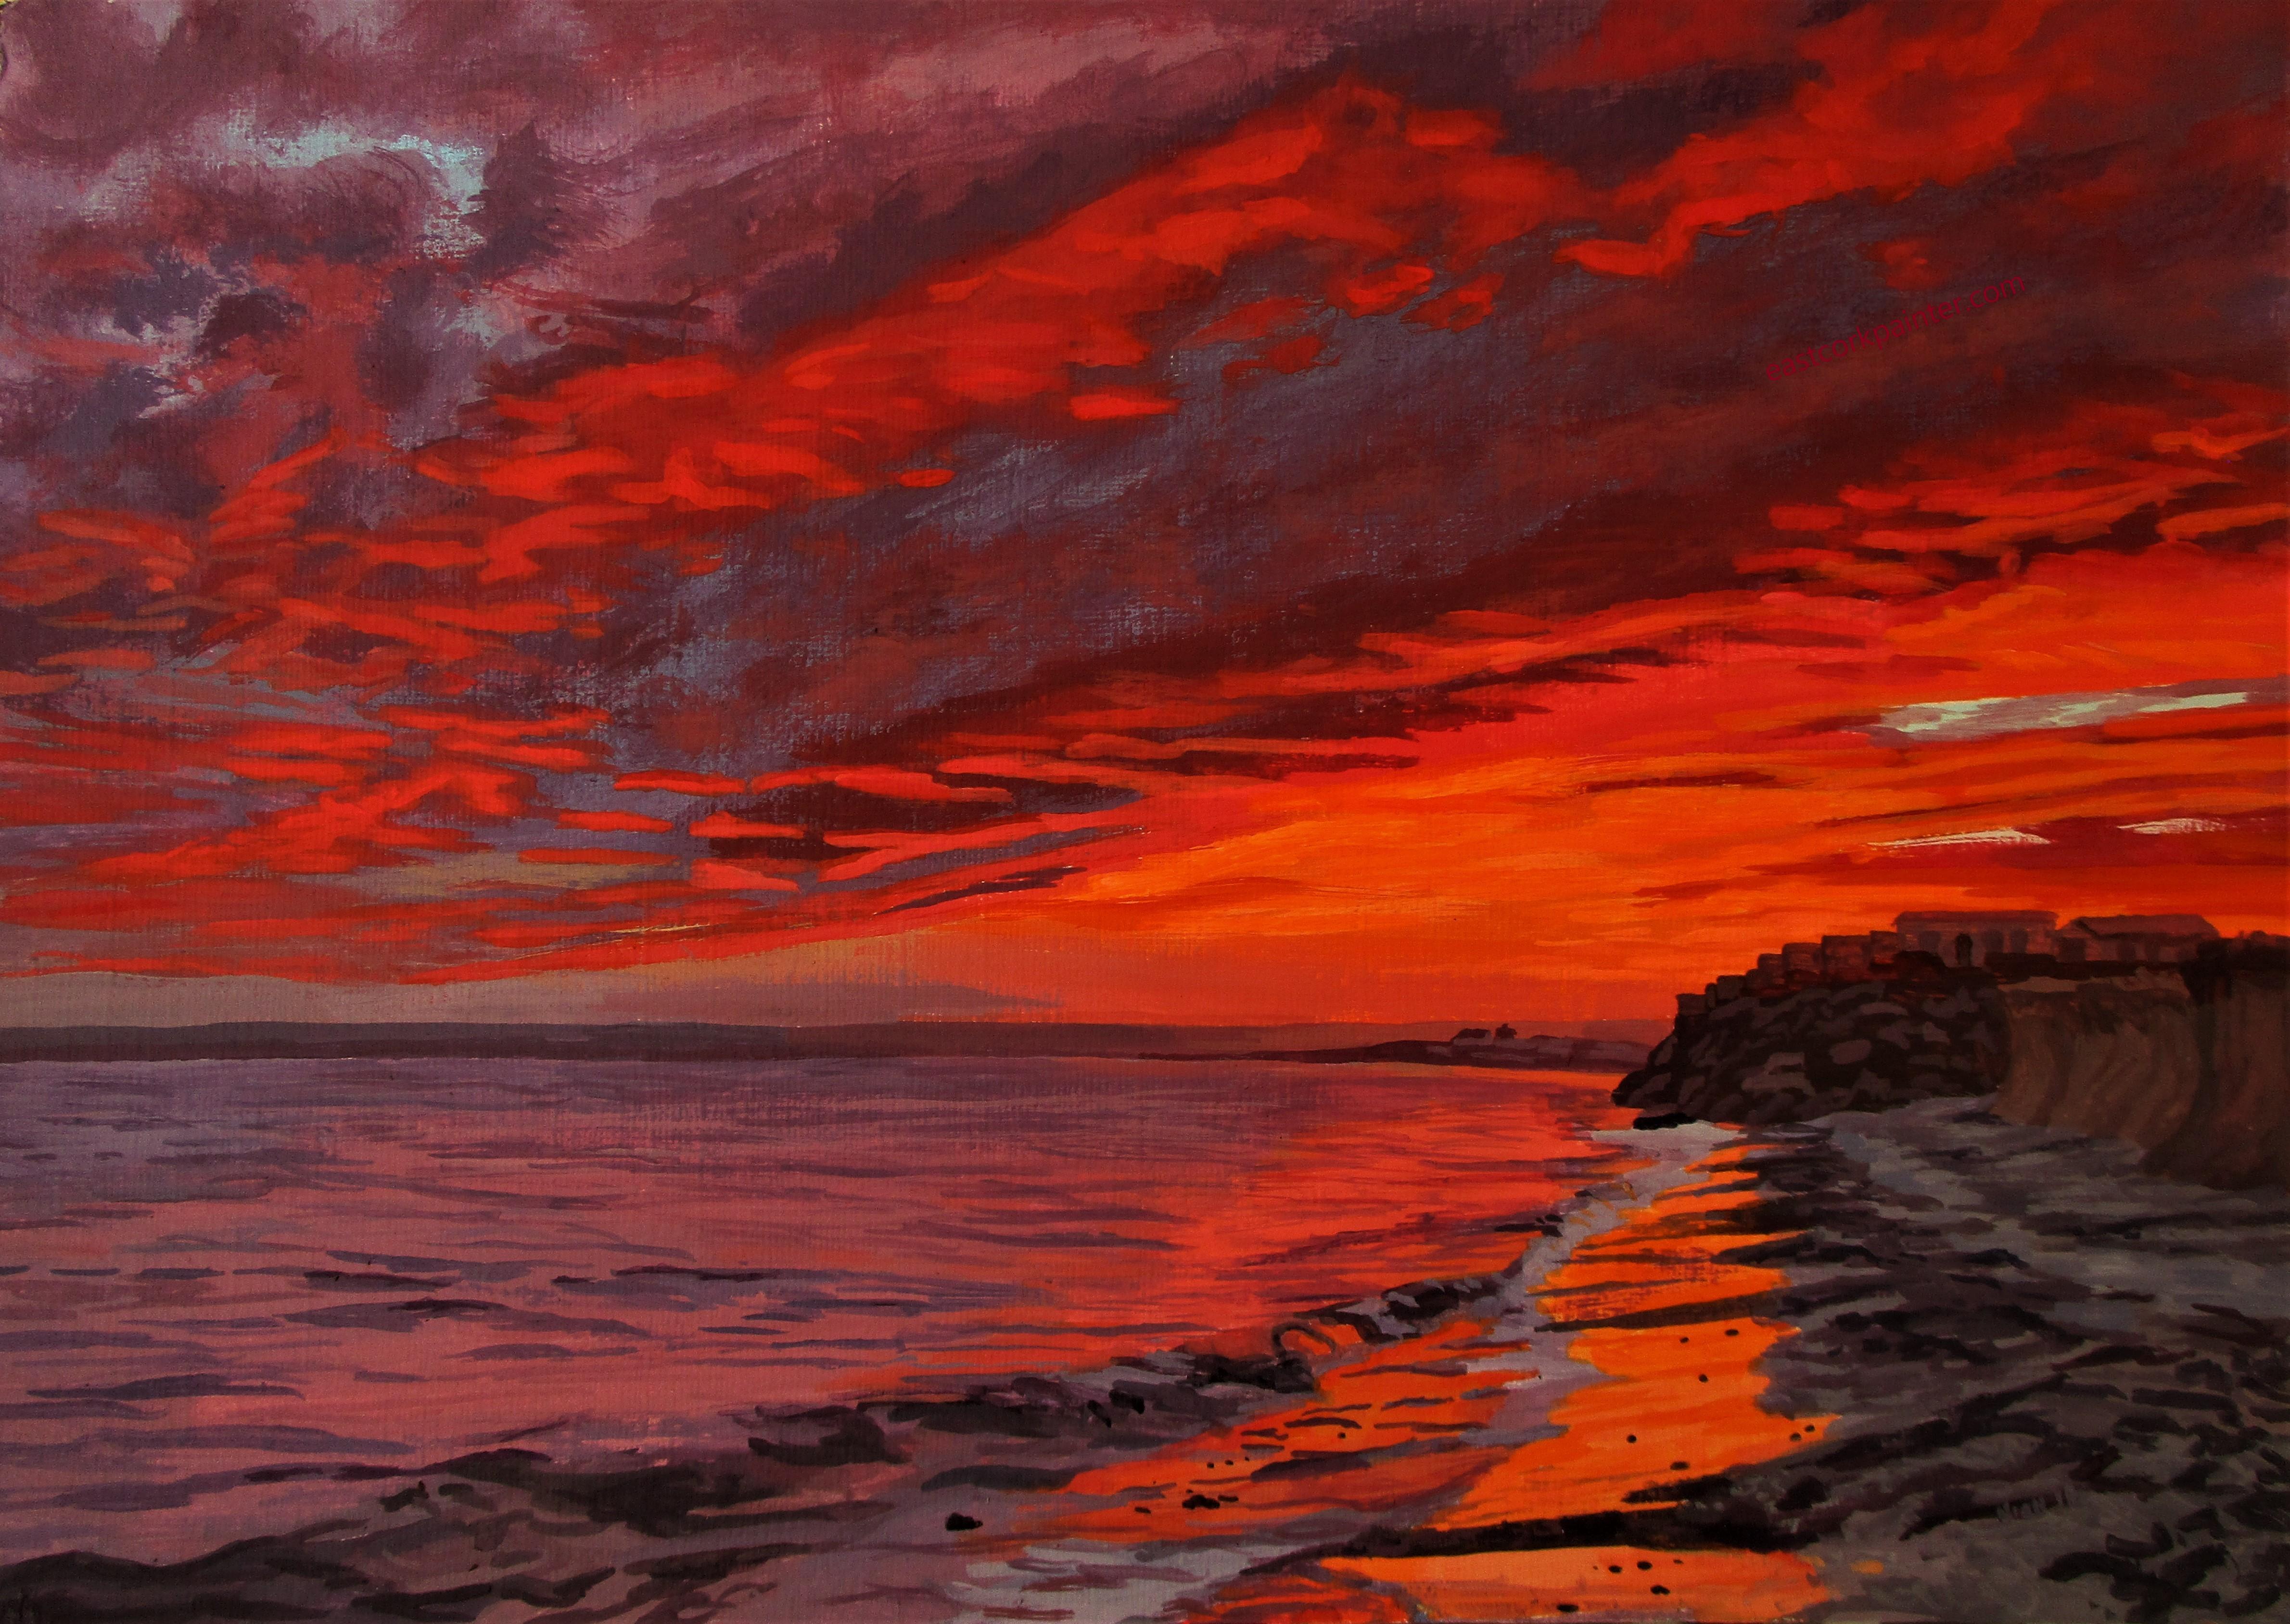 Fiery Red Sunset Over Garryvoe Beach Watermark